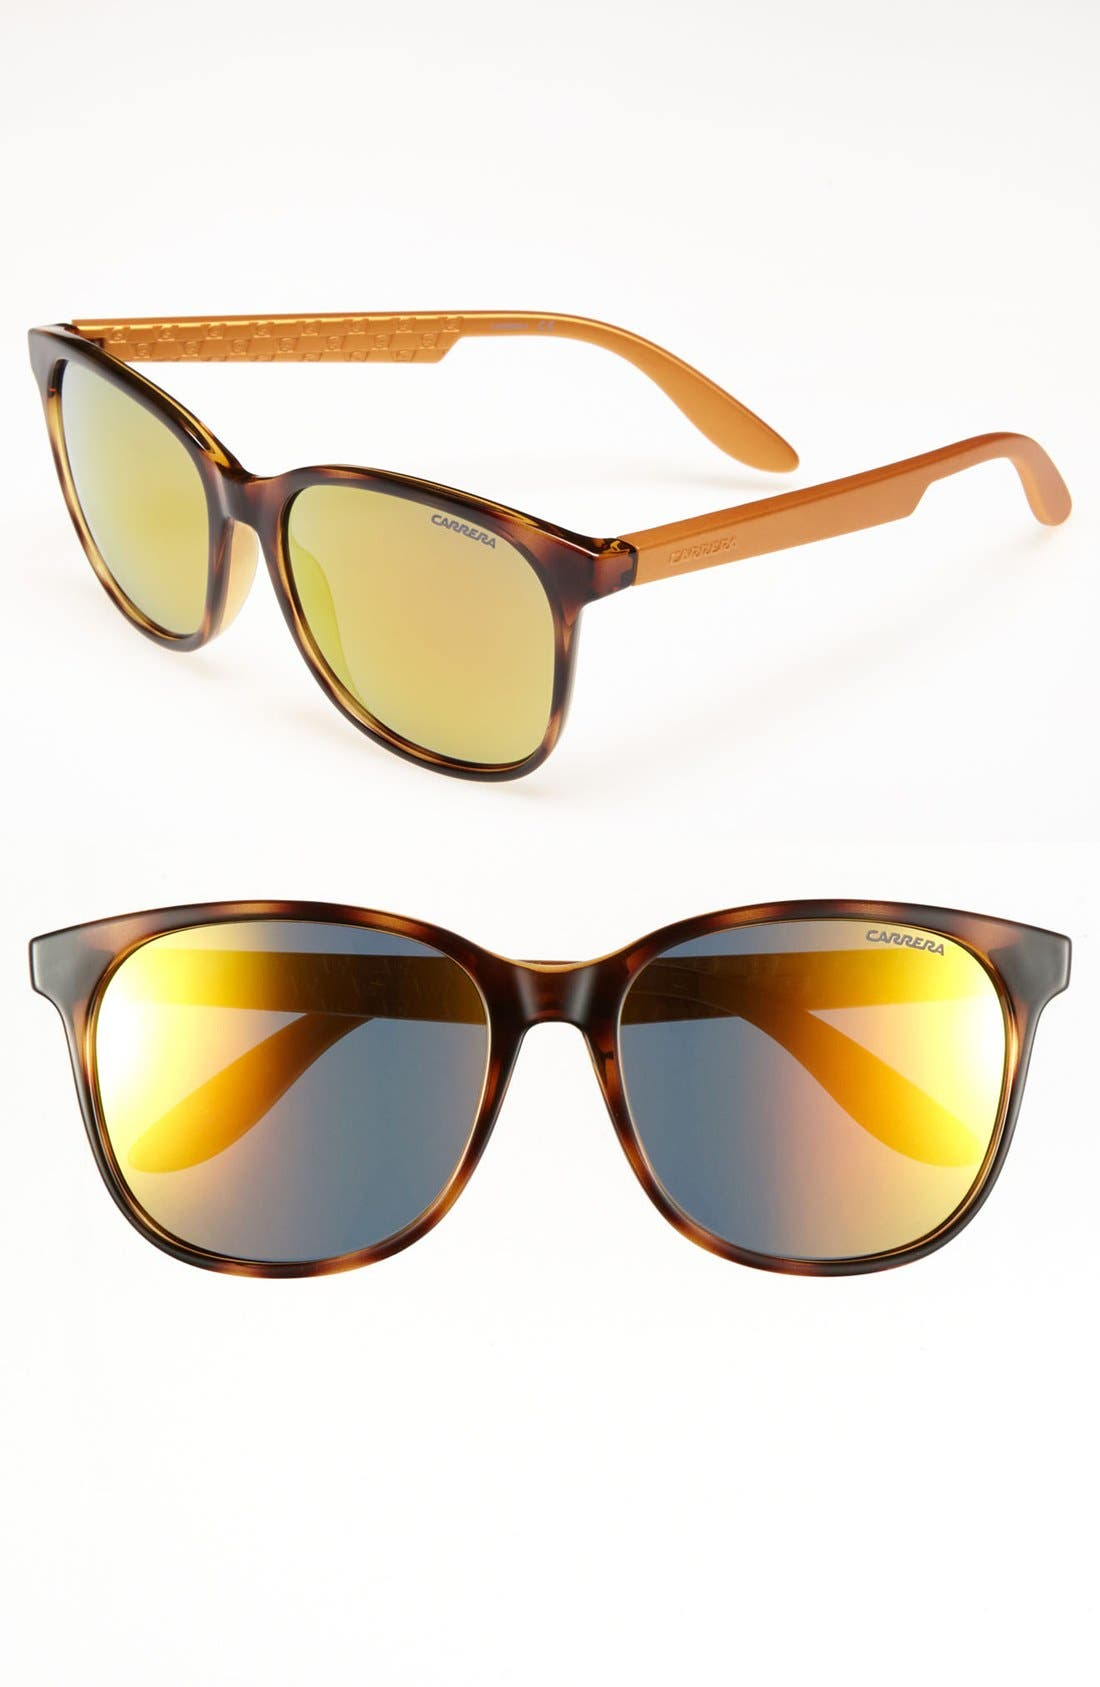 Alternate Image 1 Selected - Carrera Eyewear 56 mm Sunglasses